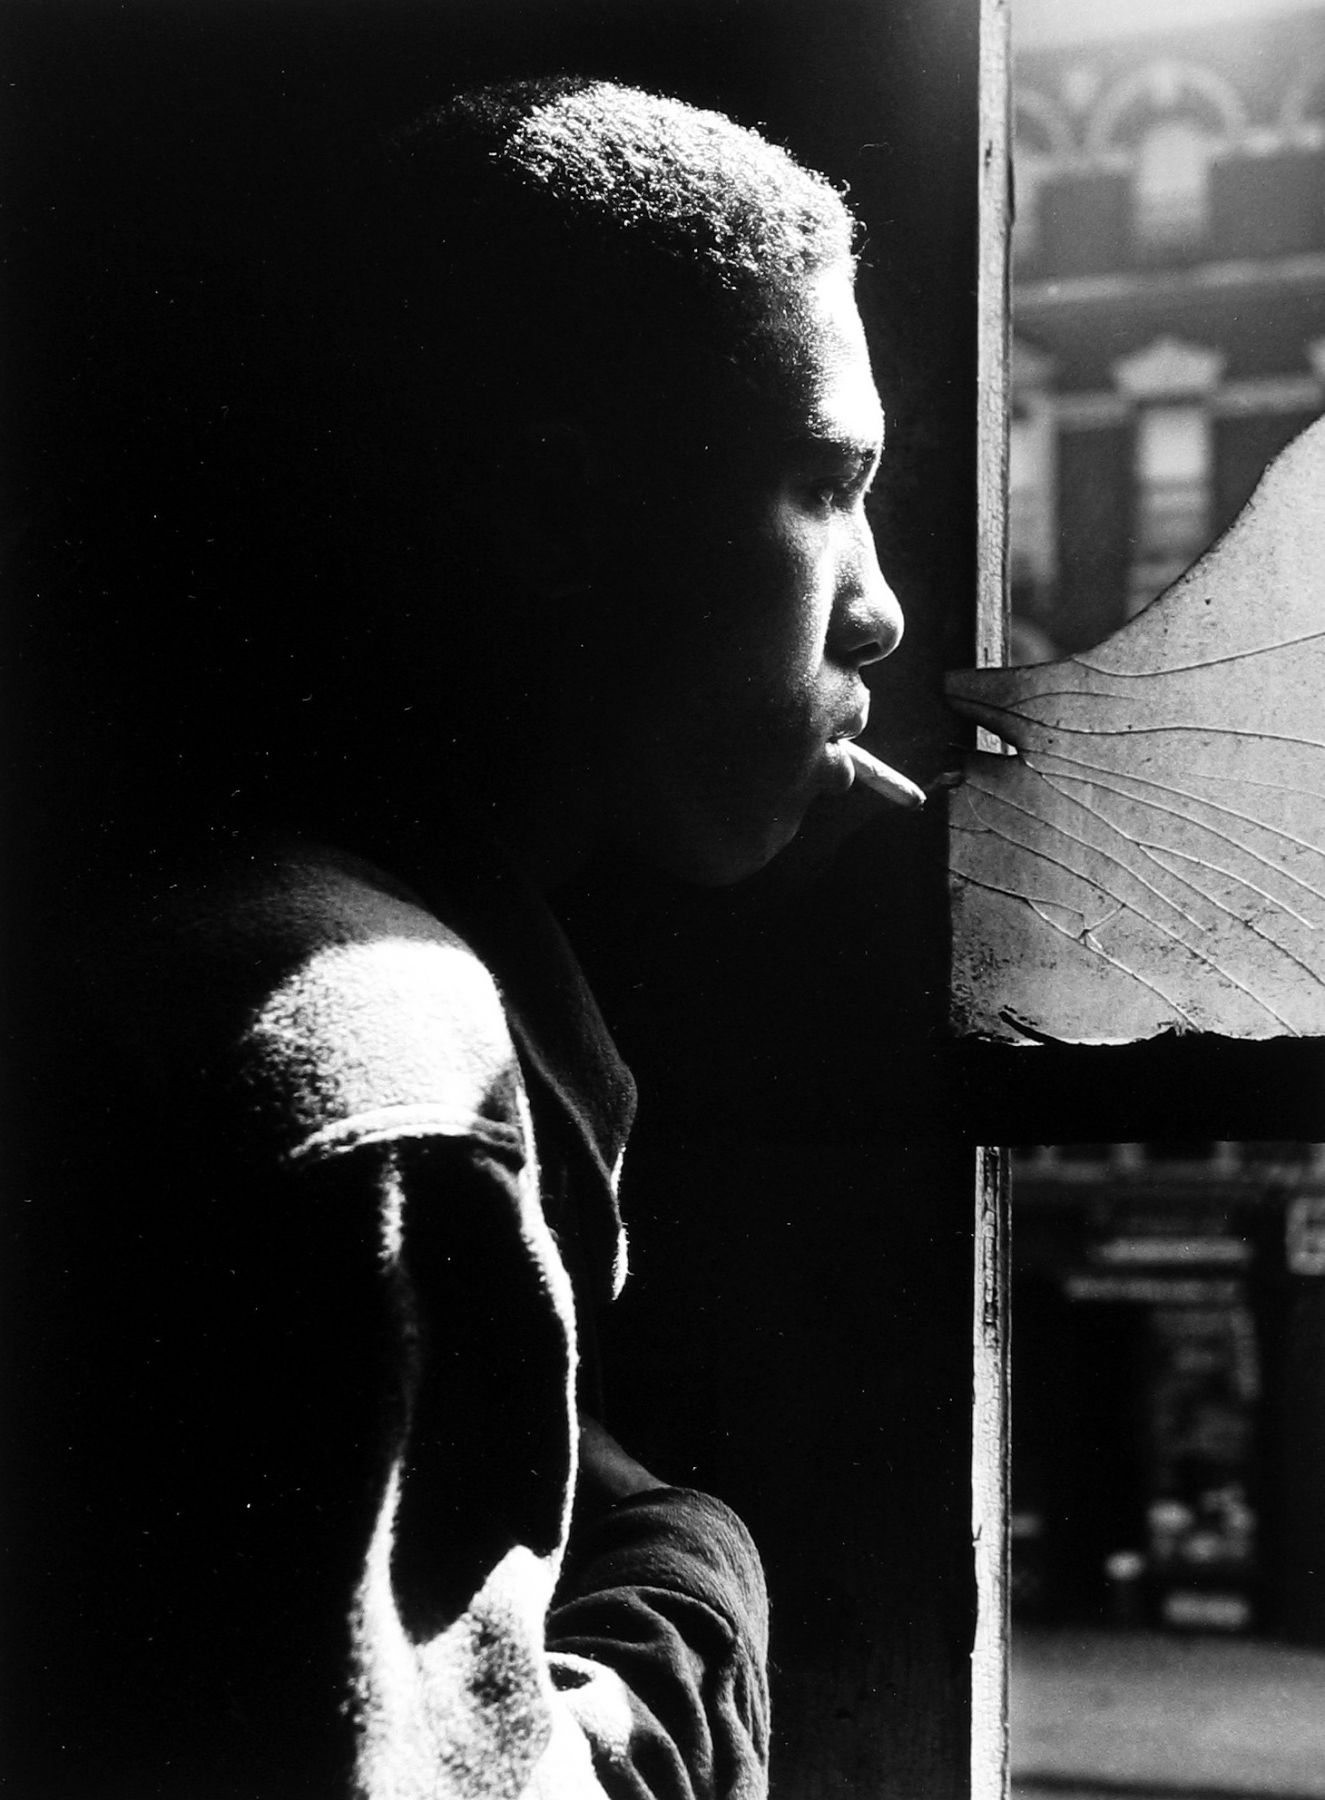 Gordon Parks - Red Jackson, 1948 - Howard Greenberg Gallery - 2019